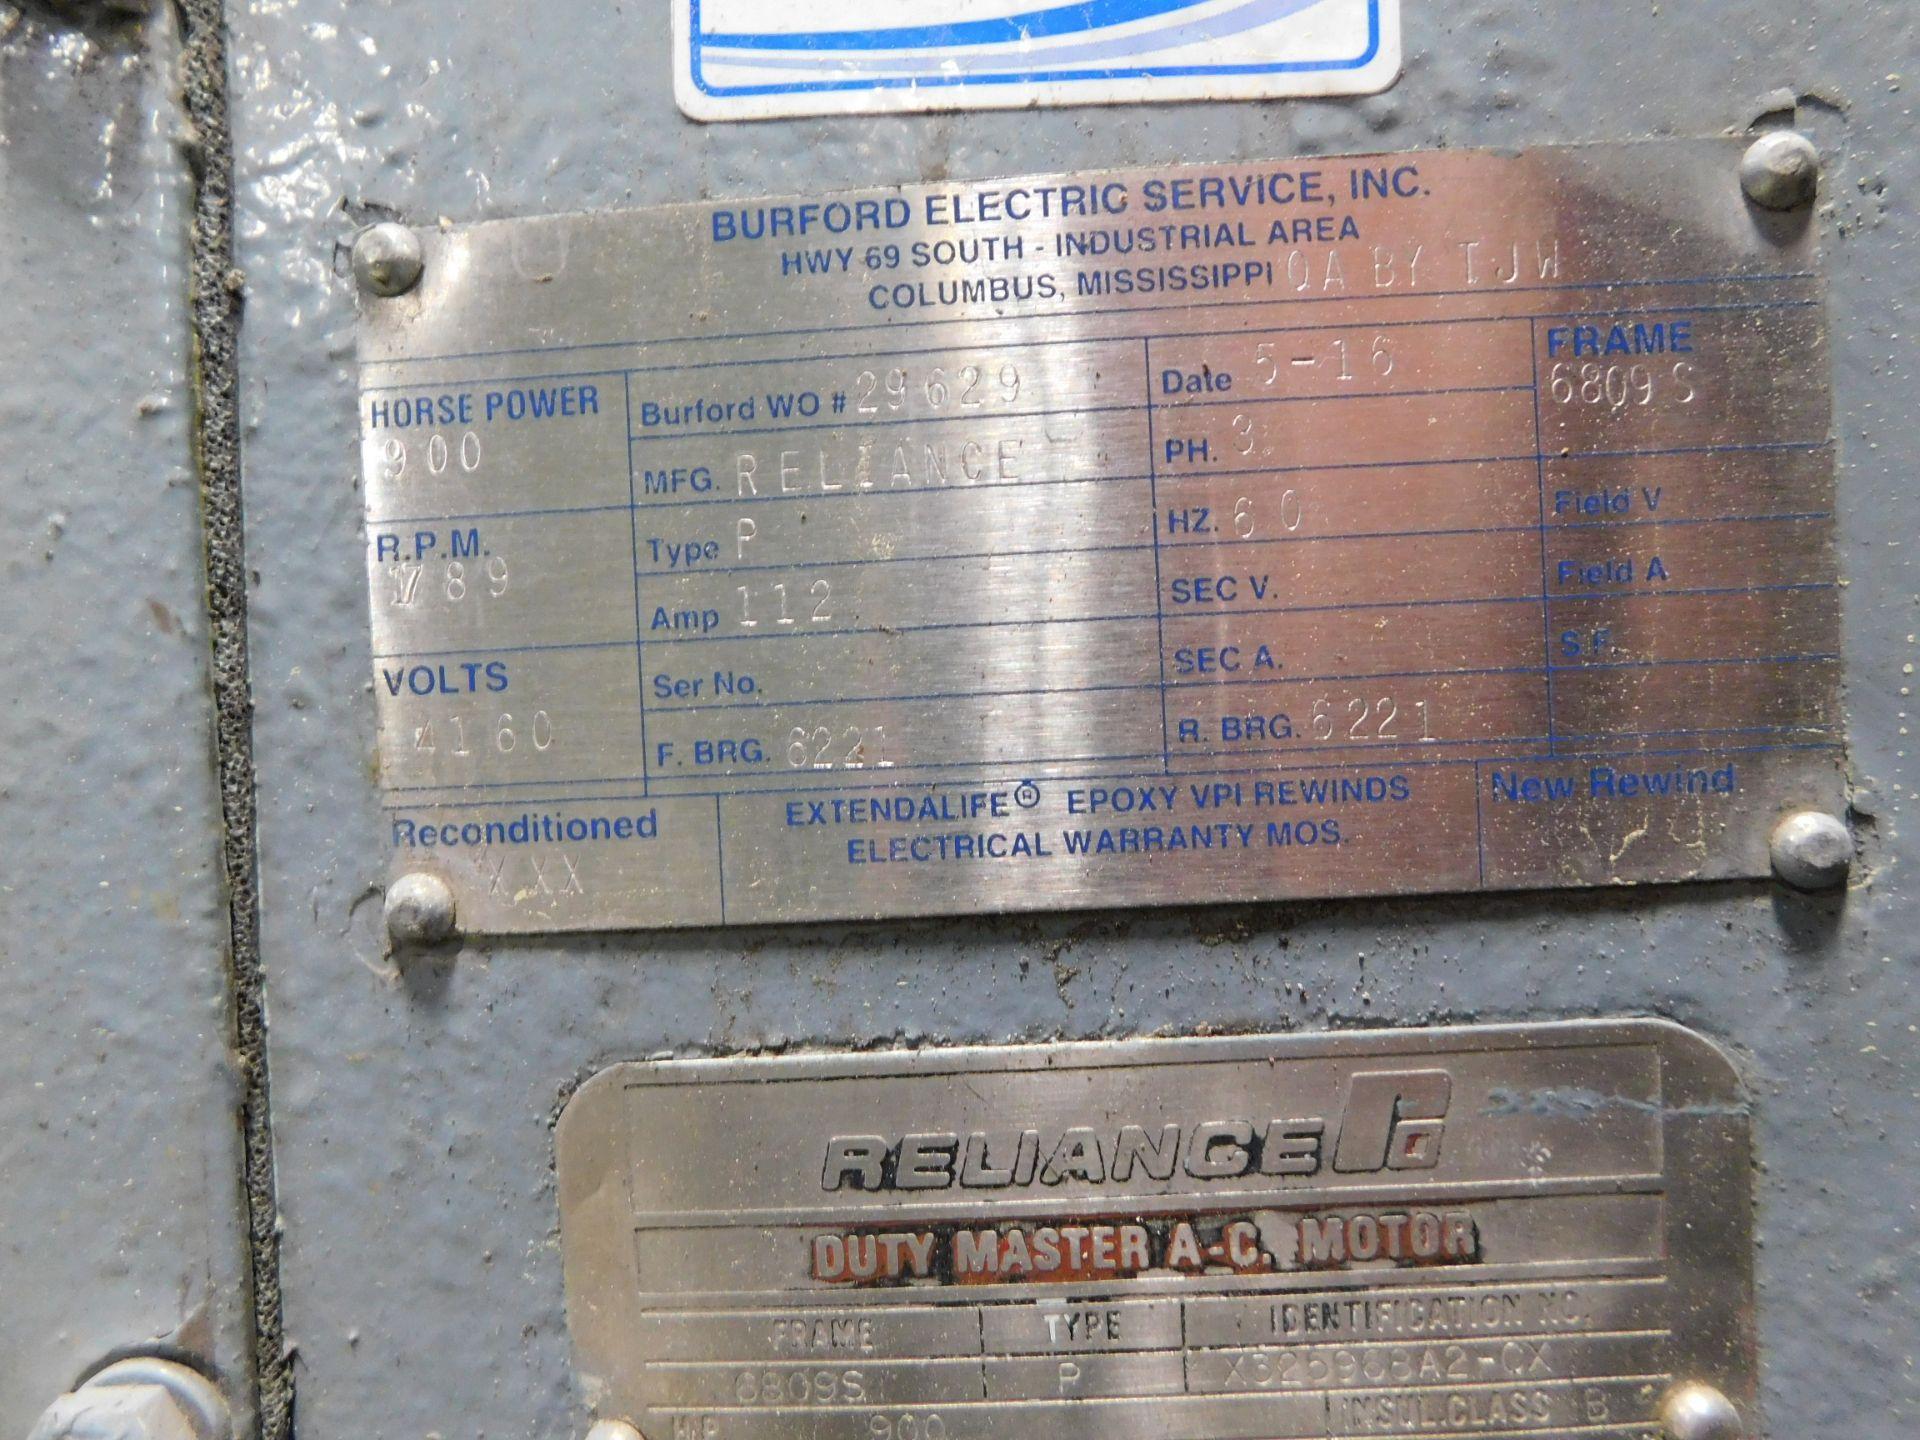 Reliance AC Duty Master Motor. 900 HP. 3 Ph. 60 Hz. 4160 V. 1789 RPM. 6809S. Type P. - Image 4 of 8